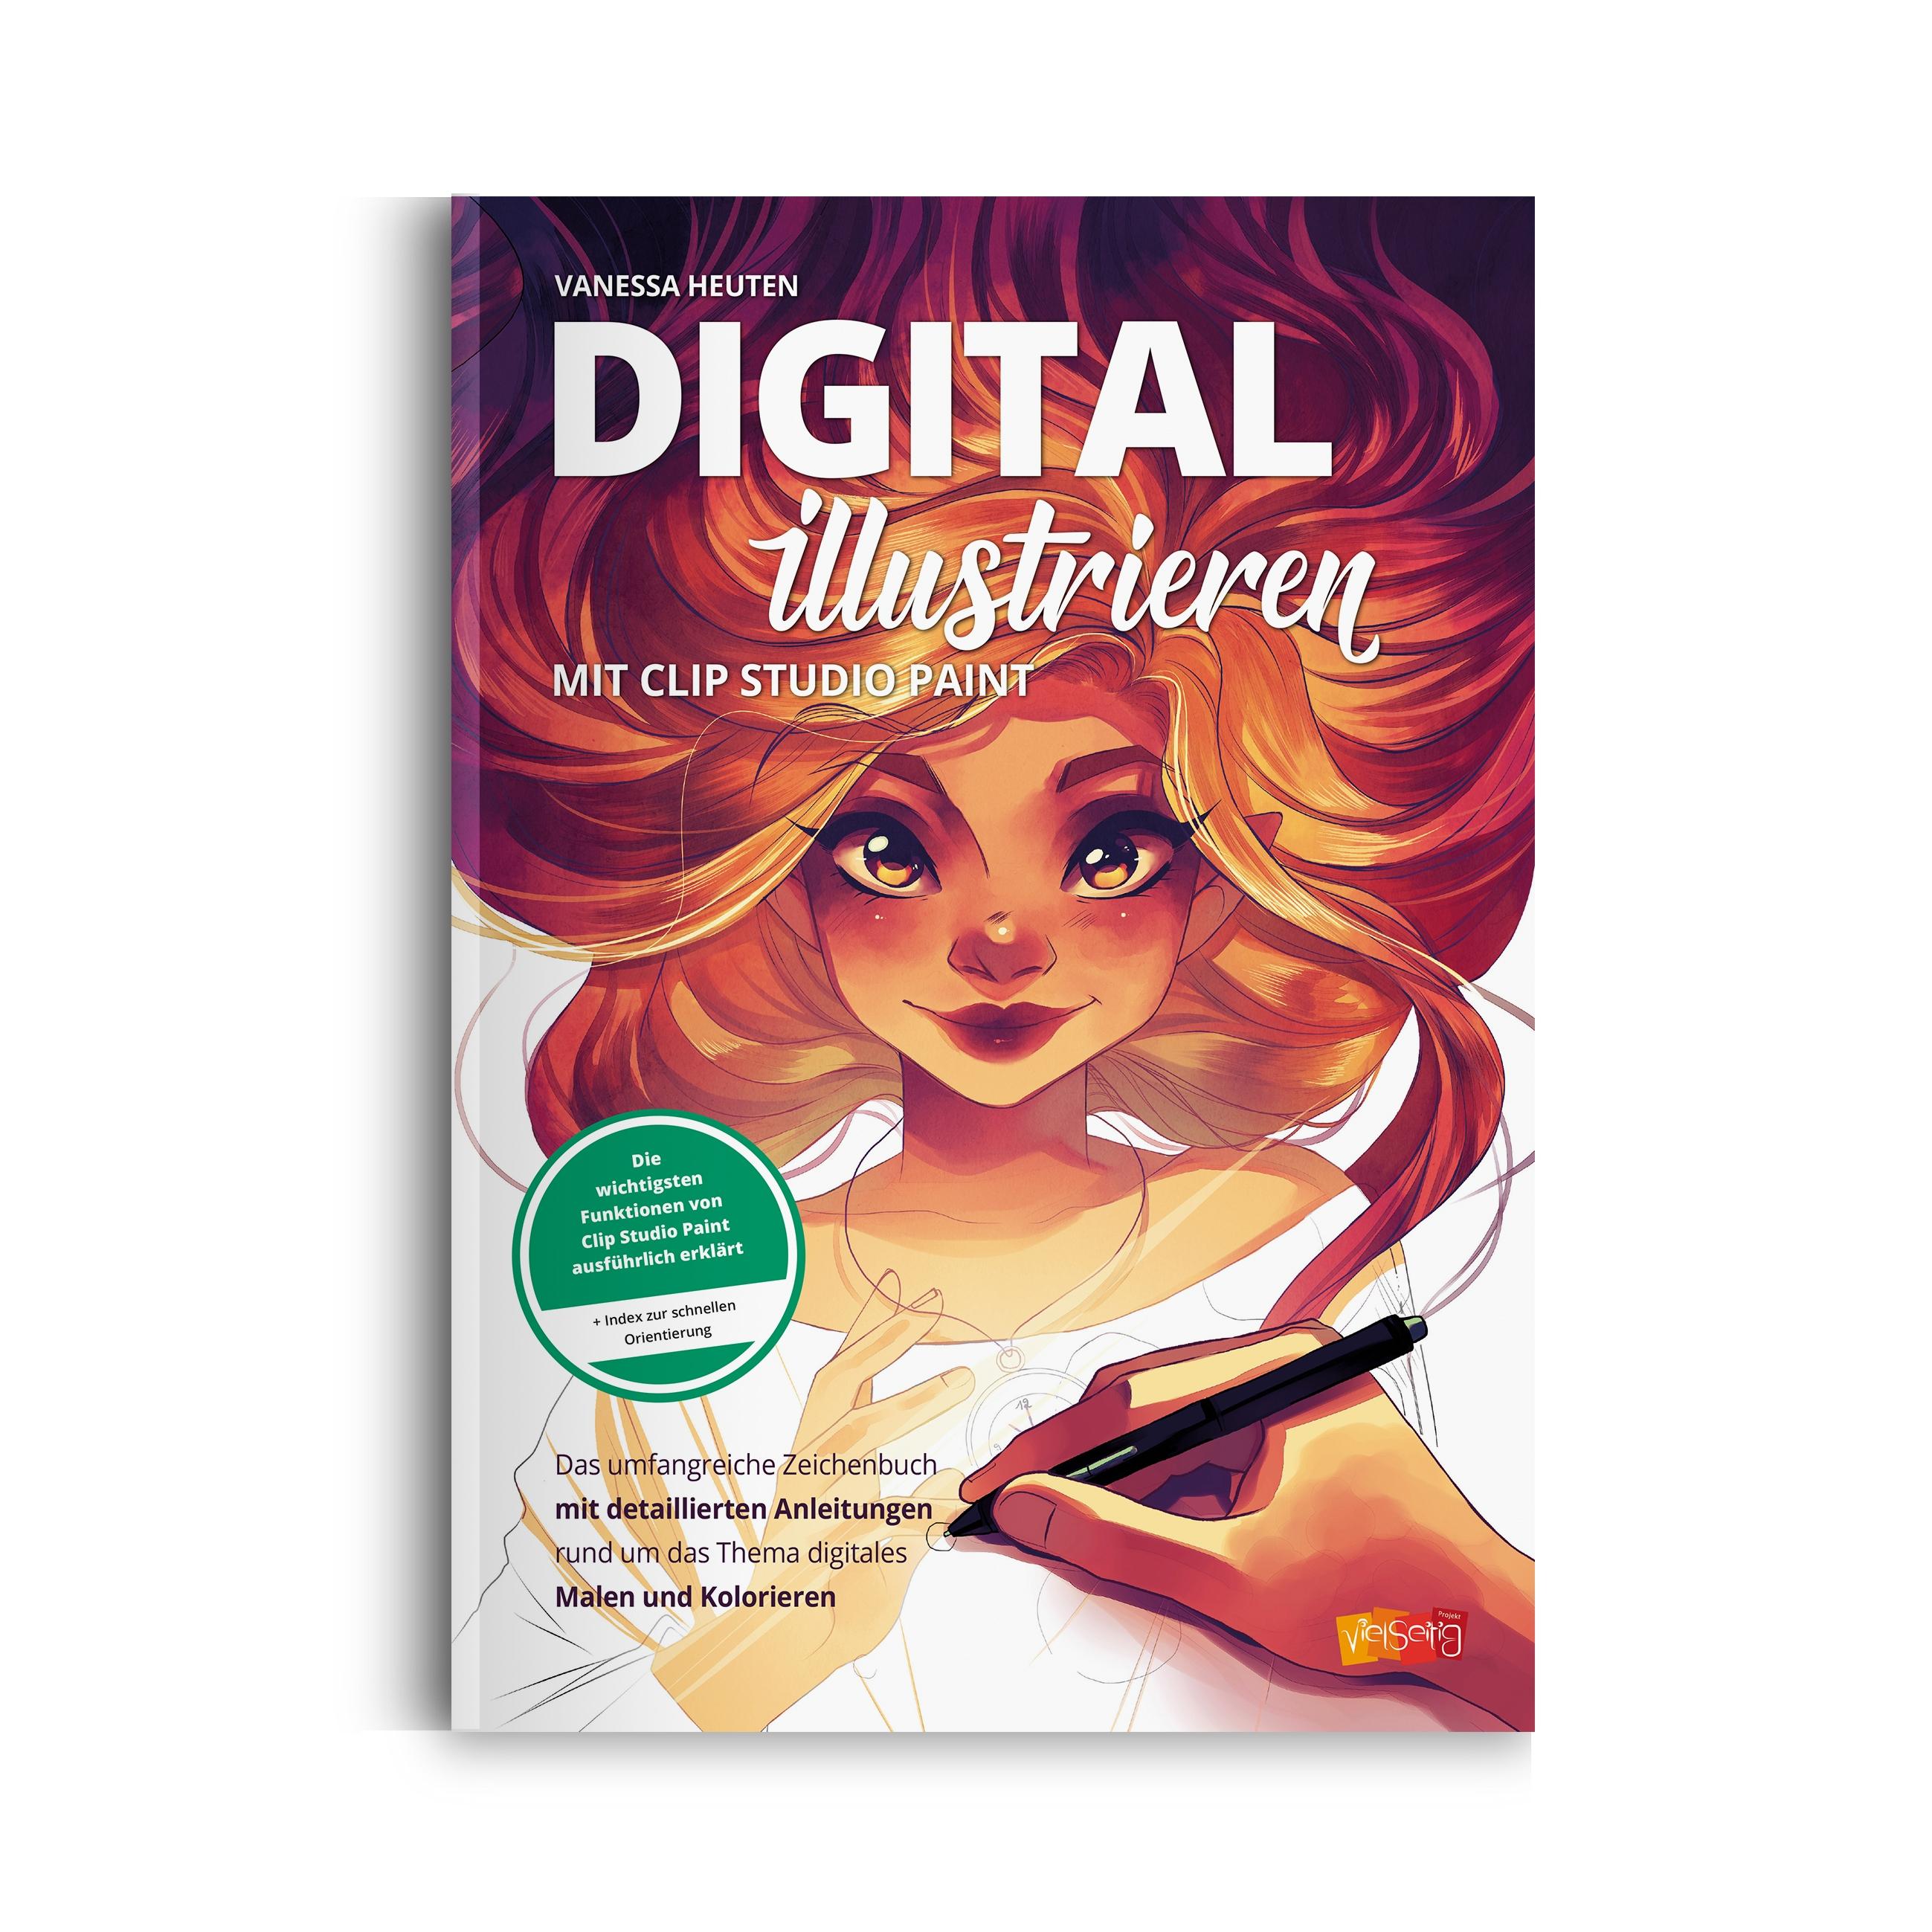 Vanessa Heuten - Digital illustrieren mit Clip Studio Paint